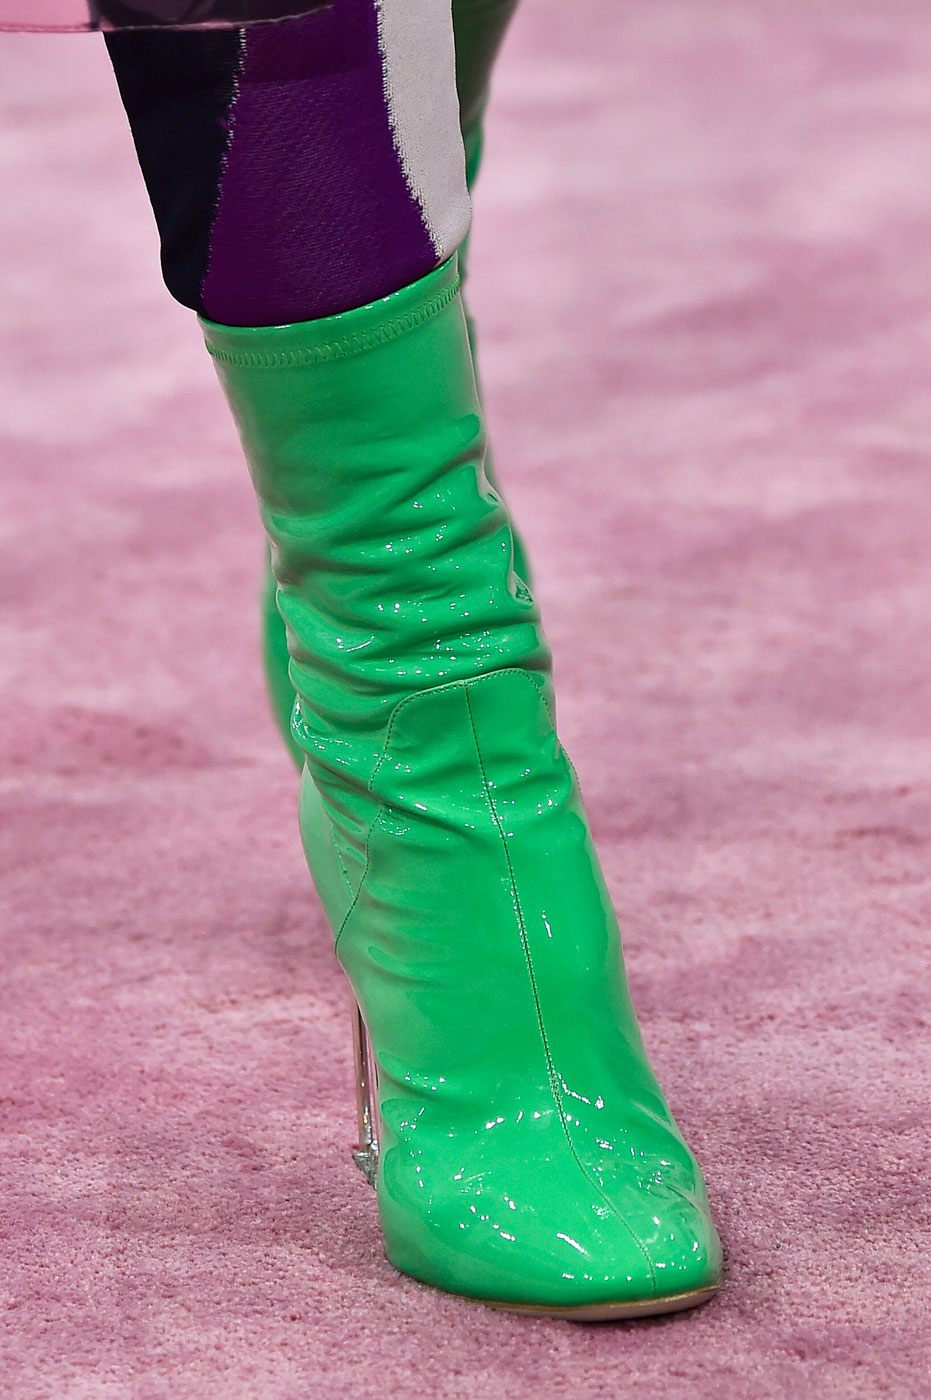 Christian-Dior-fashion-runway-show-close-ups-haute-couture-paris-spring-summer-2015-the-impression-108